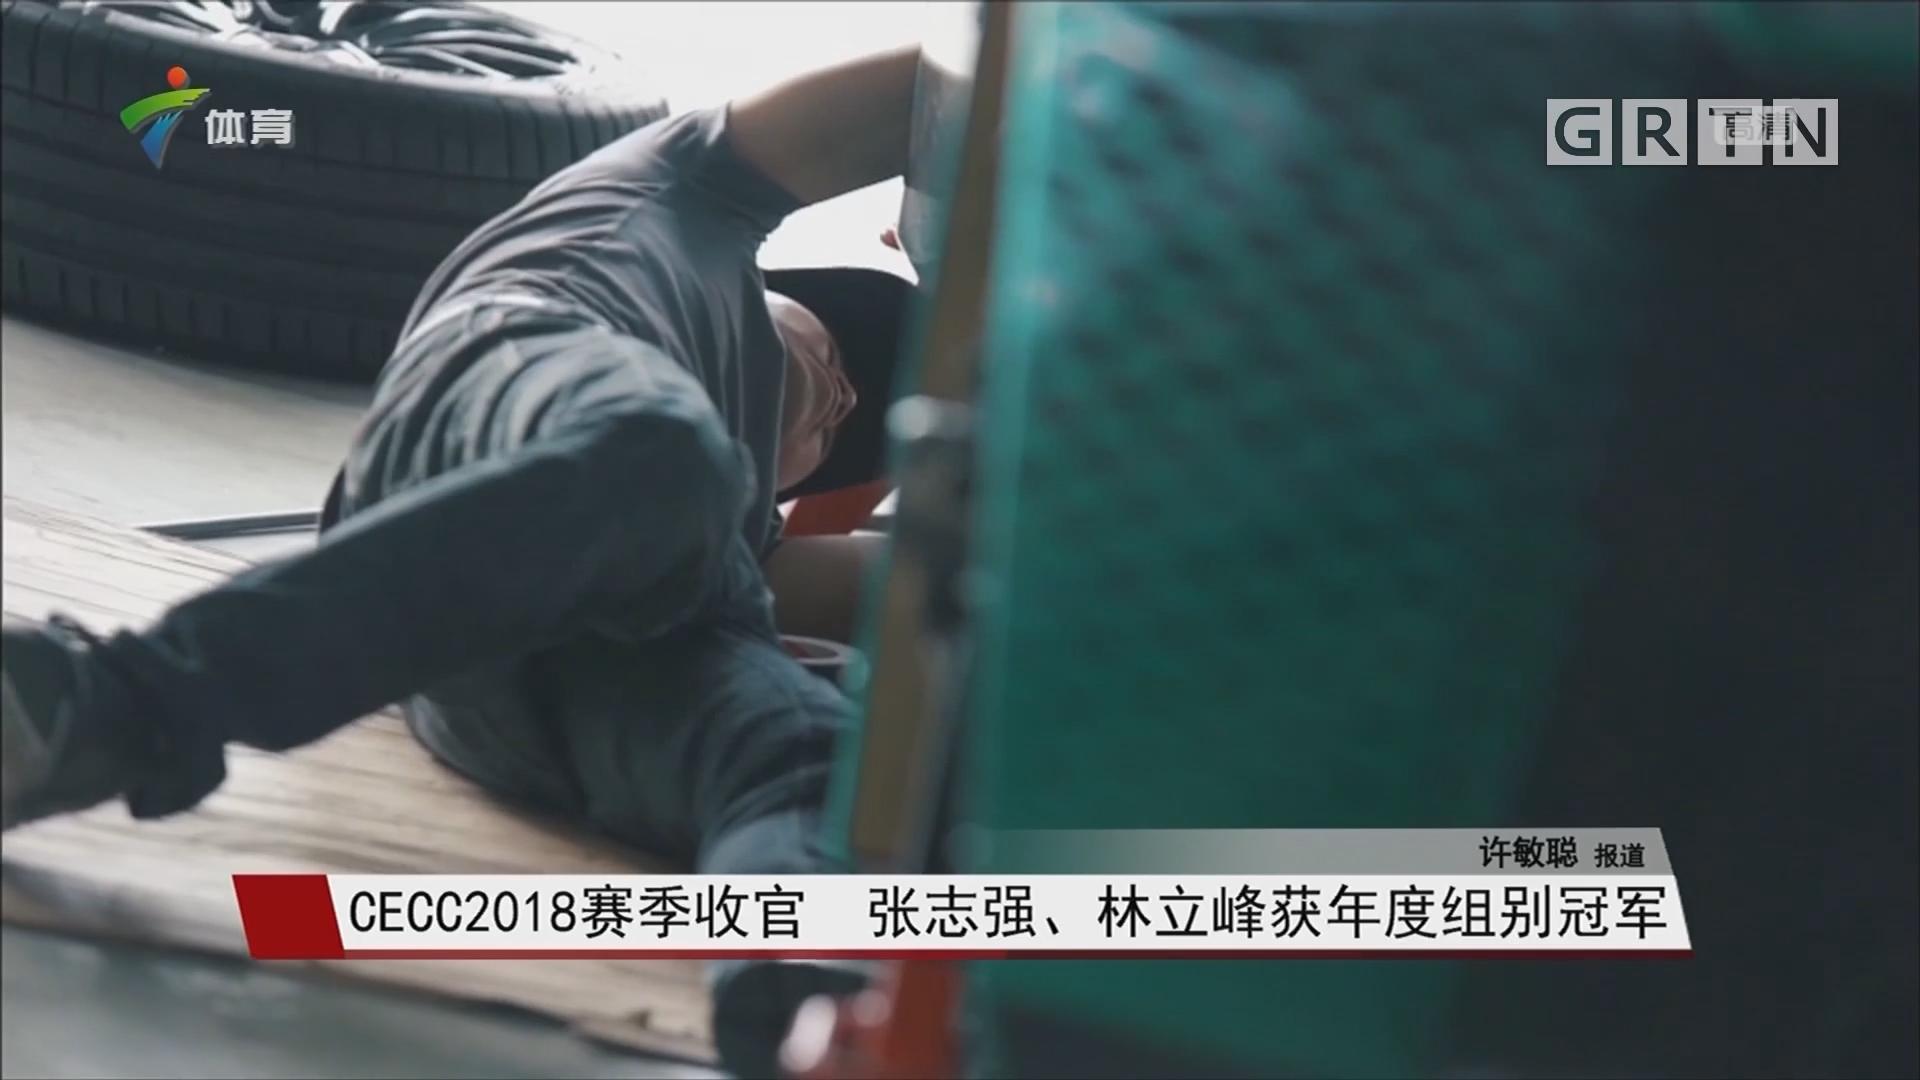 CECC2018赛季收官 张志强、林立峰获年度组别冠军